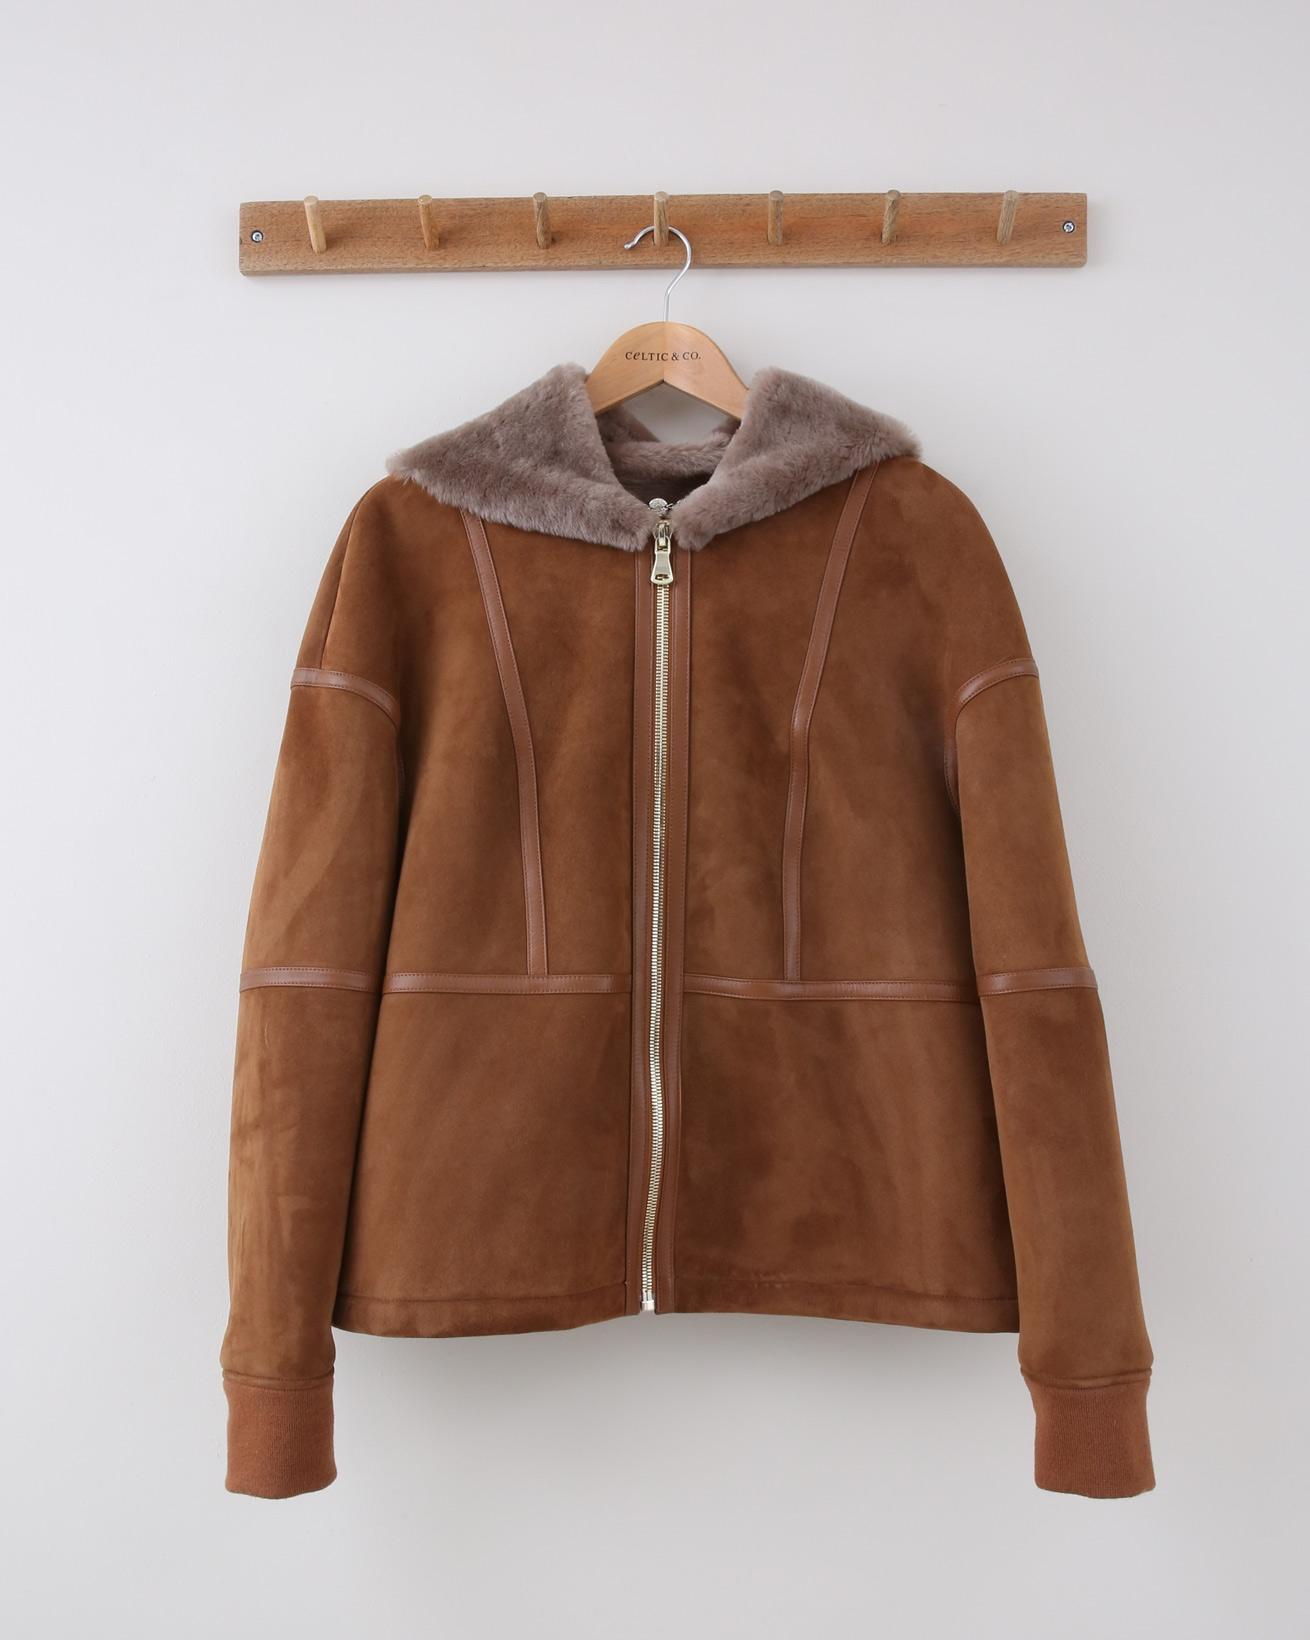 Hooded Sheepskin Jacket - Size Medium - Tan & Mink - 1489